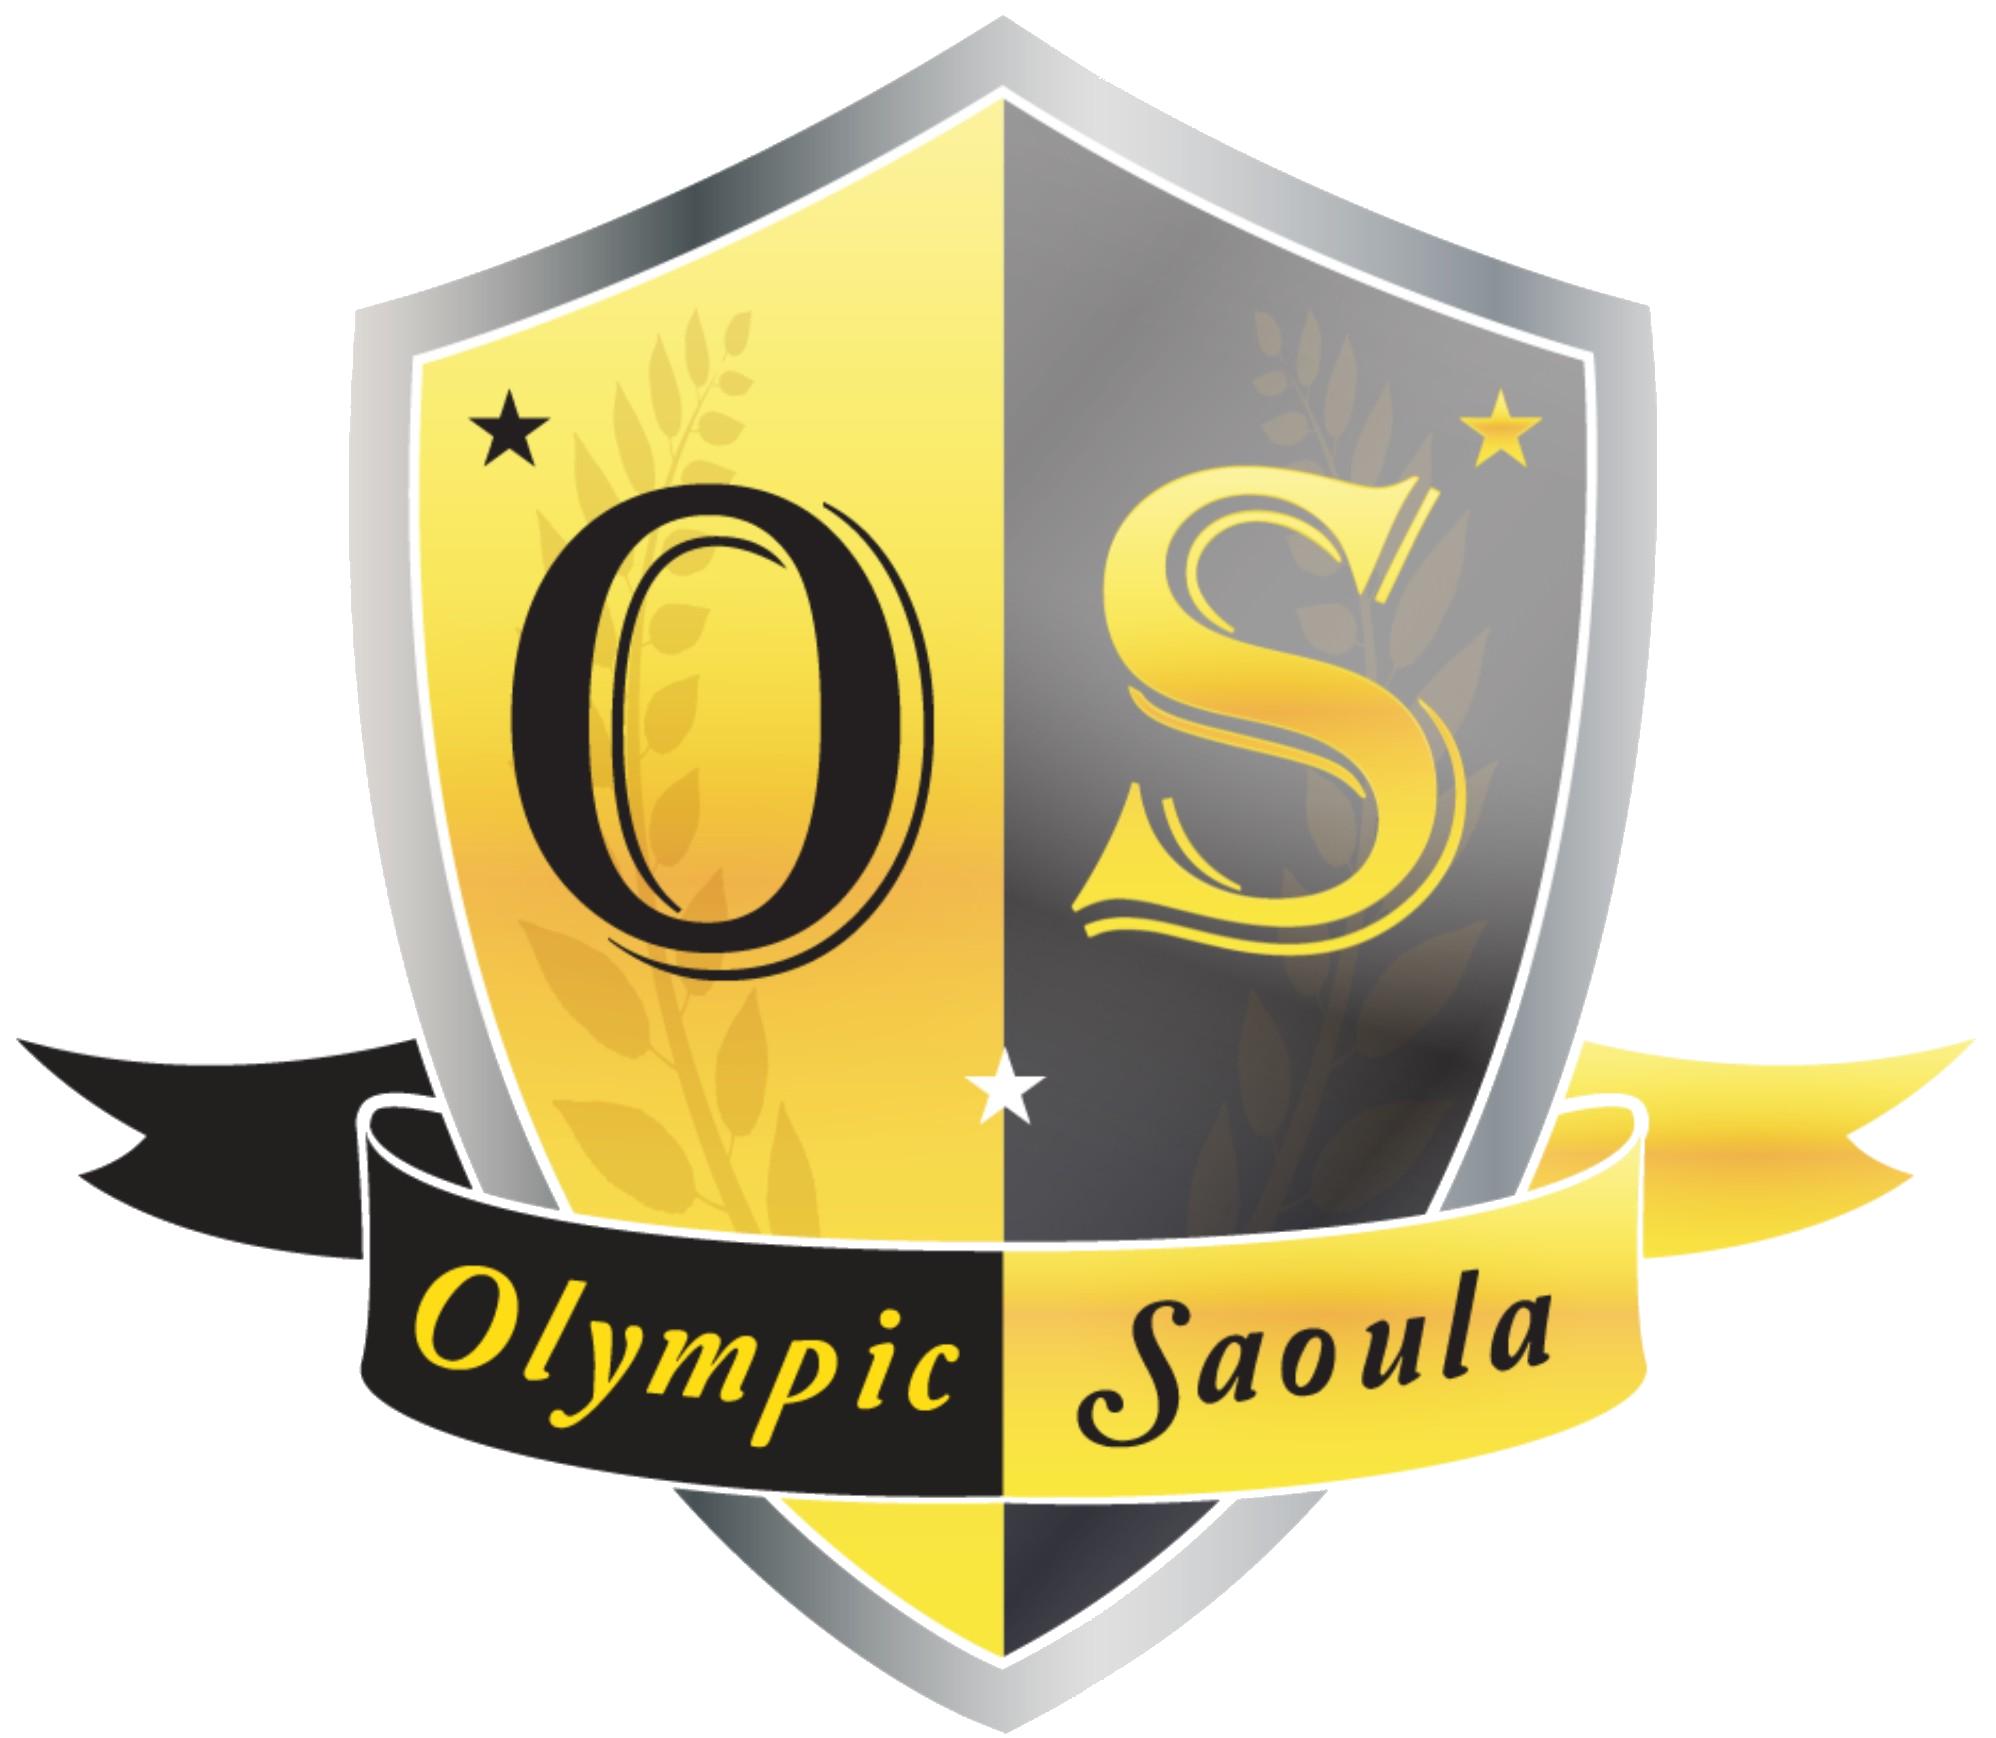 Olympic Saoula